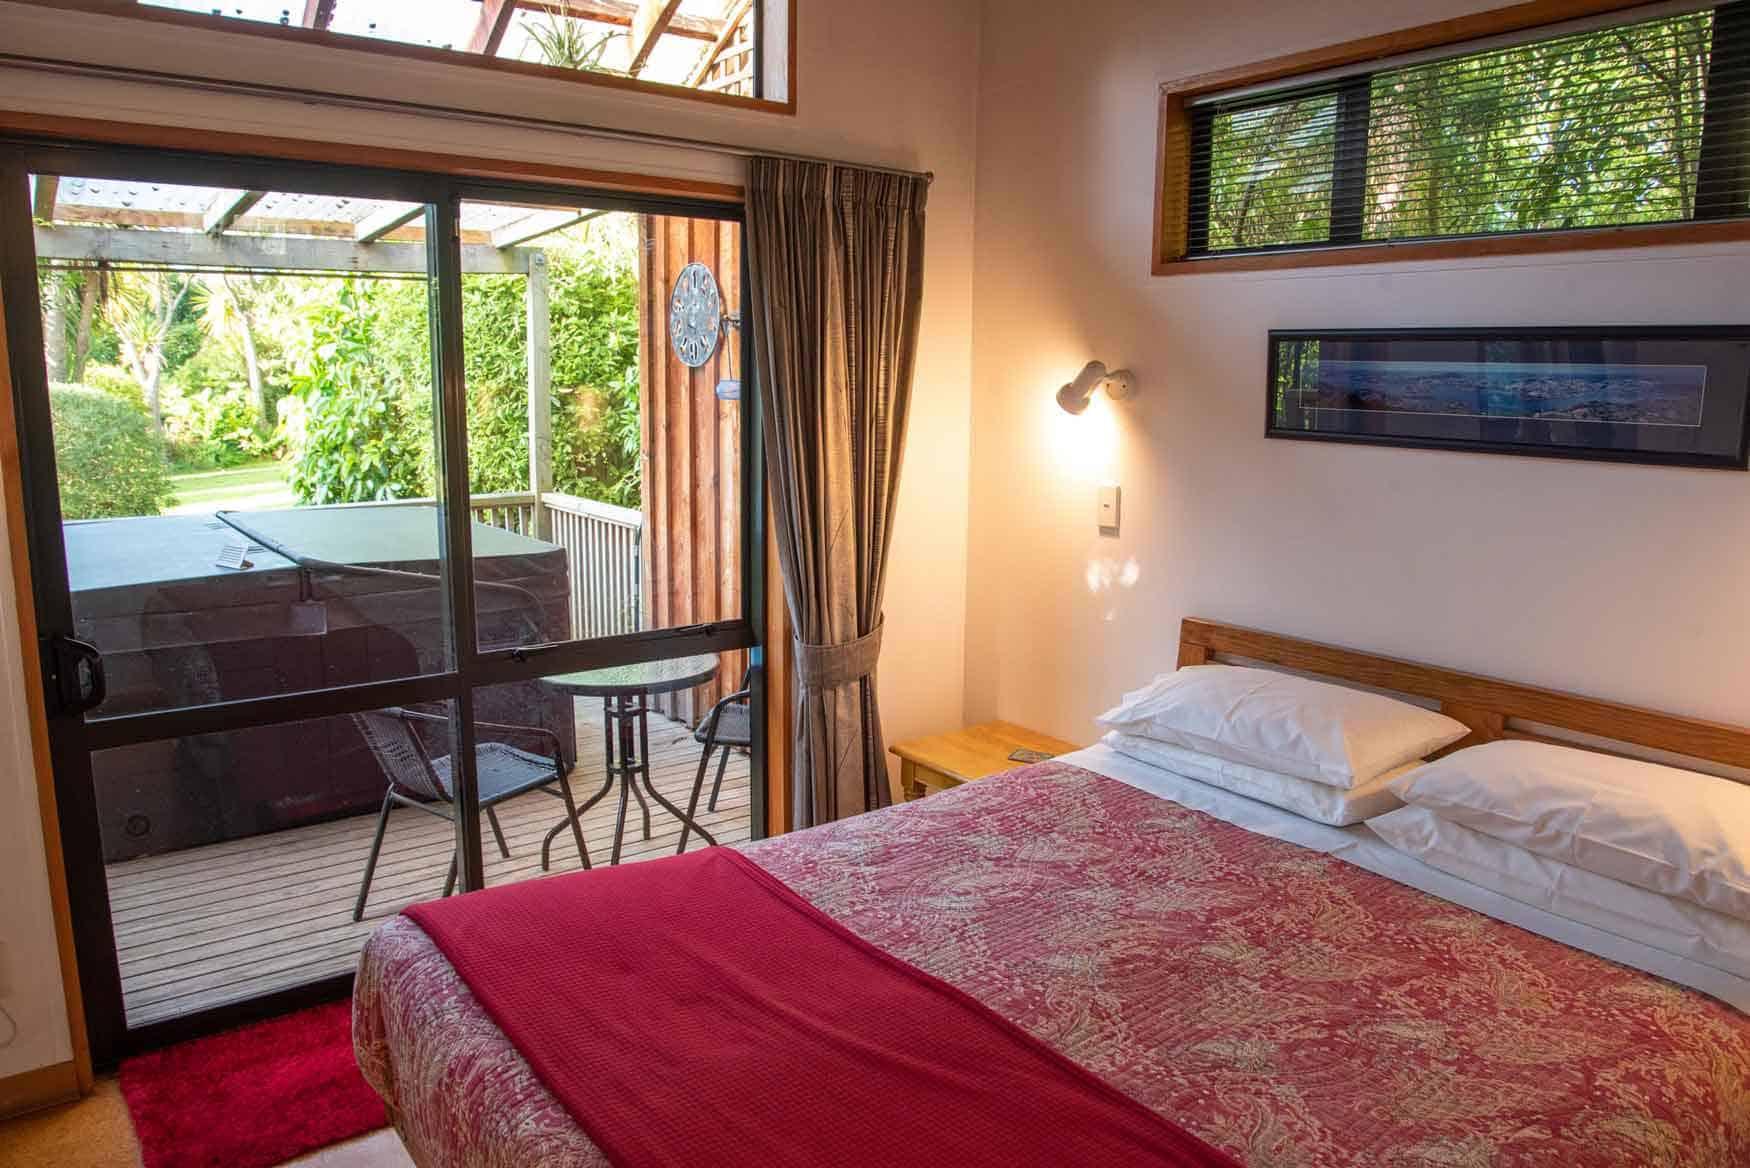 Bedroom of Bellbird Cottage accommodation in Dunedin